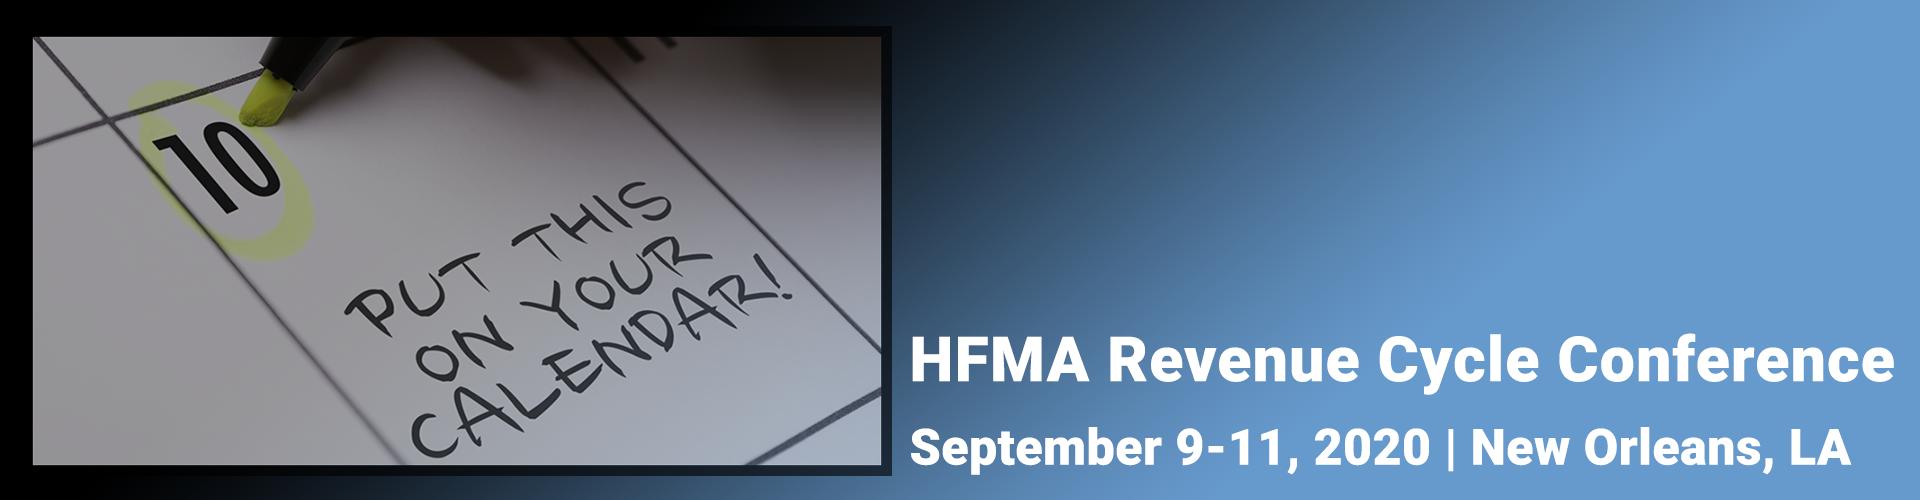 Calendar-Notice-HFMA-REVCYCLE-NEW